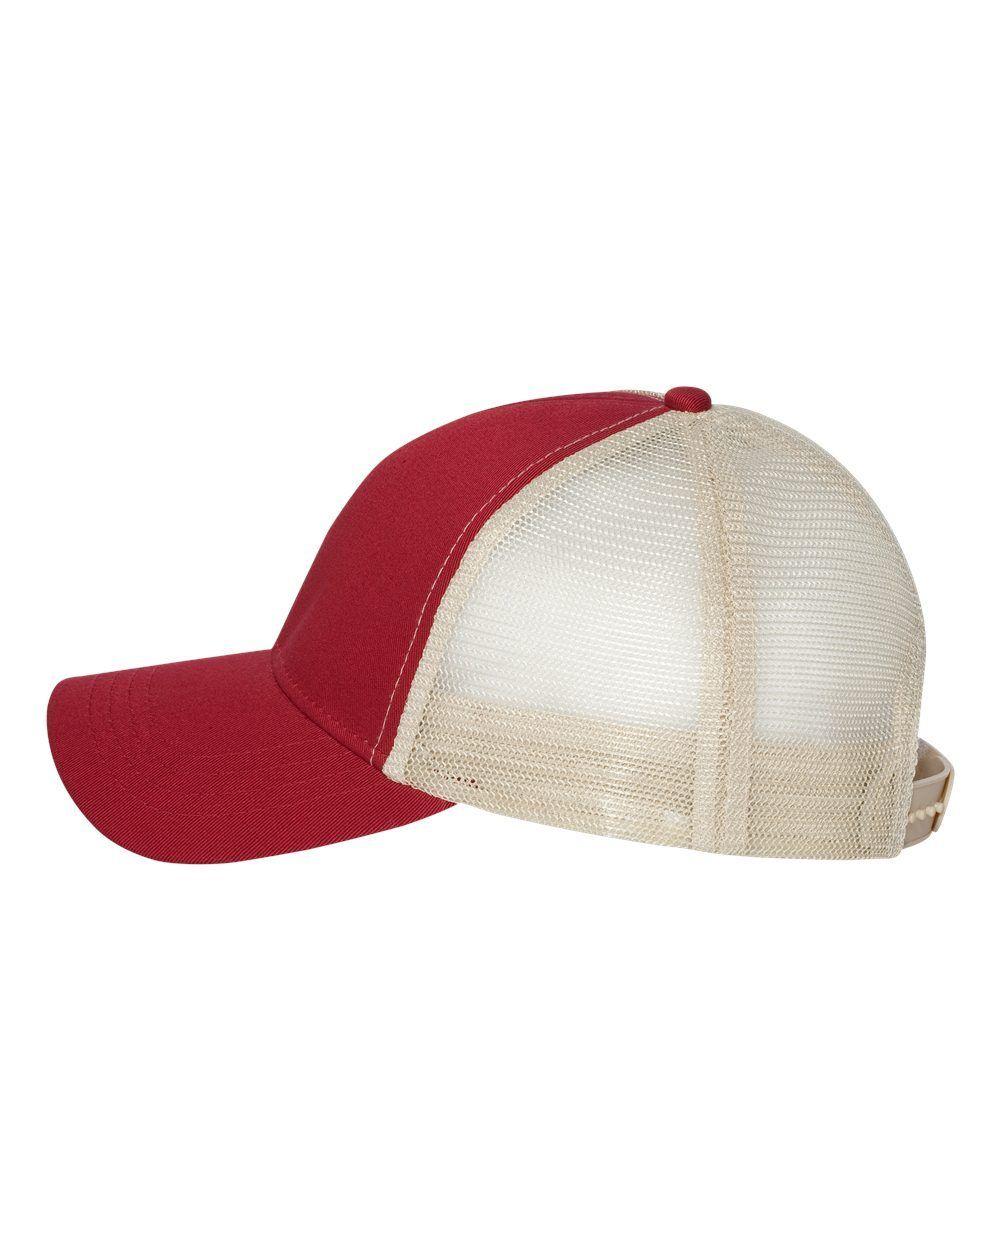 80850f46 Click to Enlarge. DESCRIpTION. Econscious Re2 Trucker Style Baseball Cap,  Organic Cotton Hat